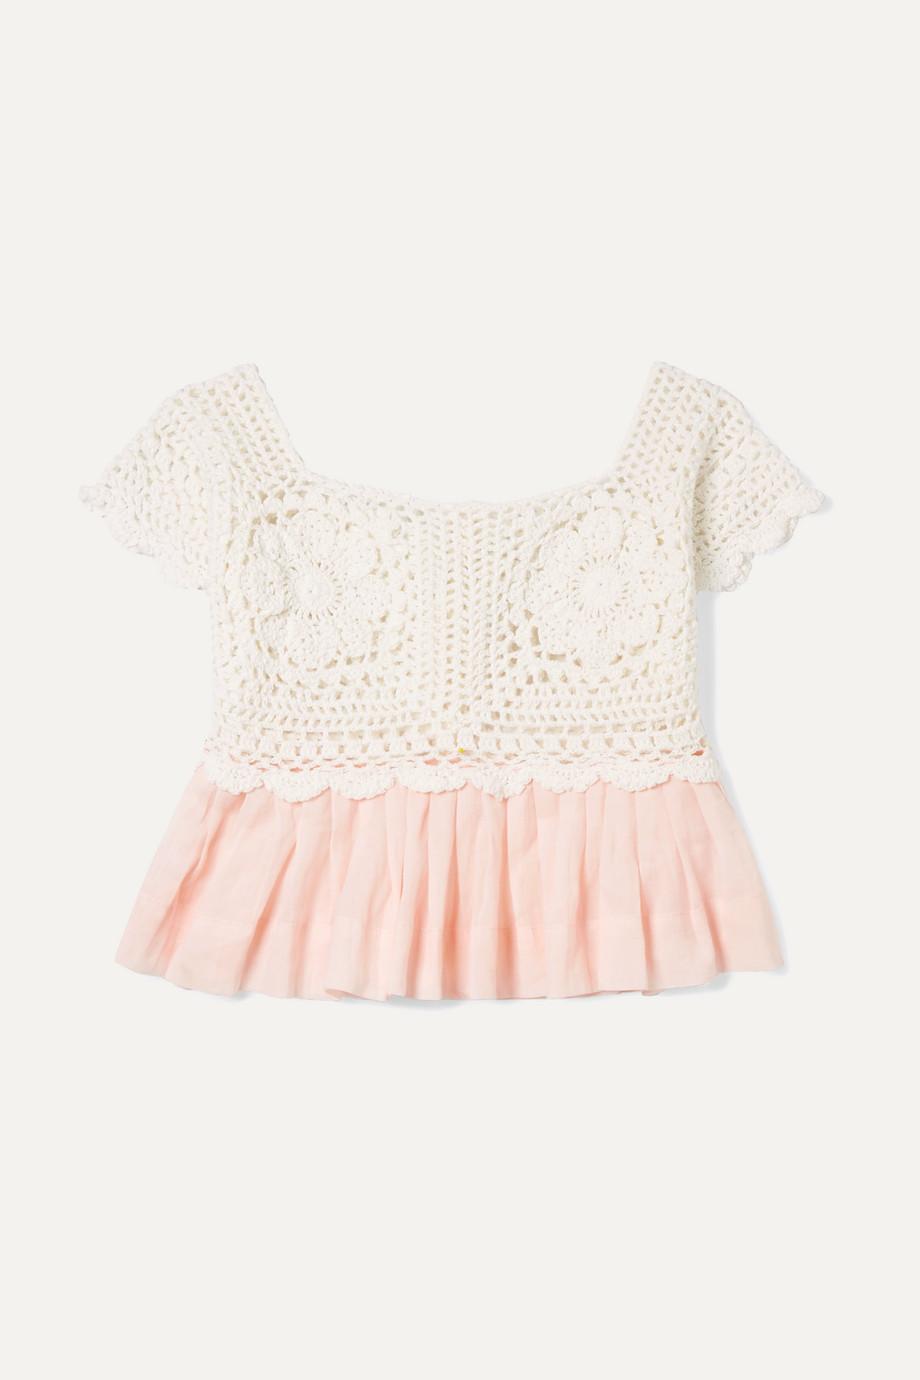 Innika Choo Kids Crocheted cotton and ramie top